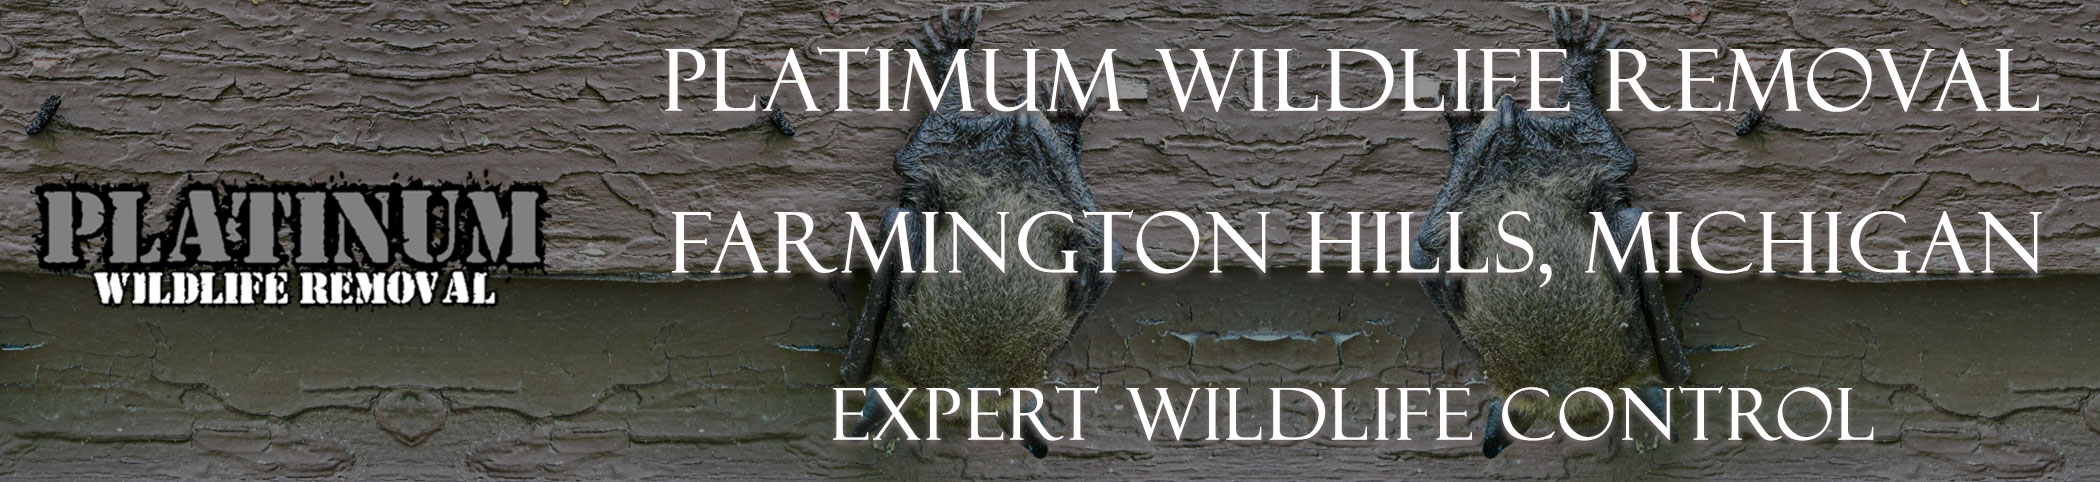 Farmington-Hills-Platinum-Wildlife-Removal-michgan